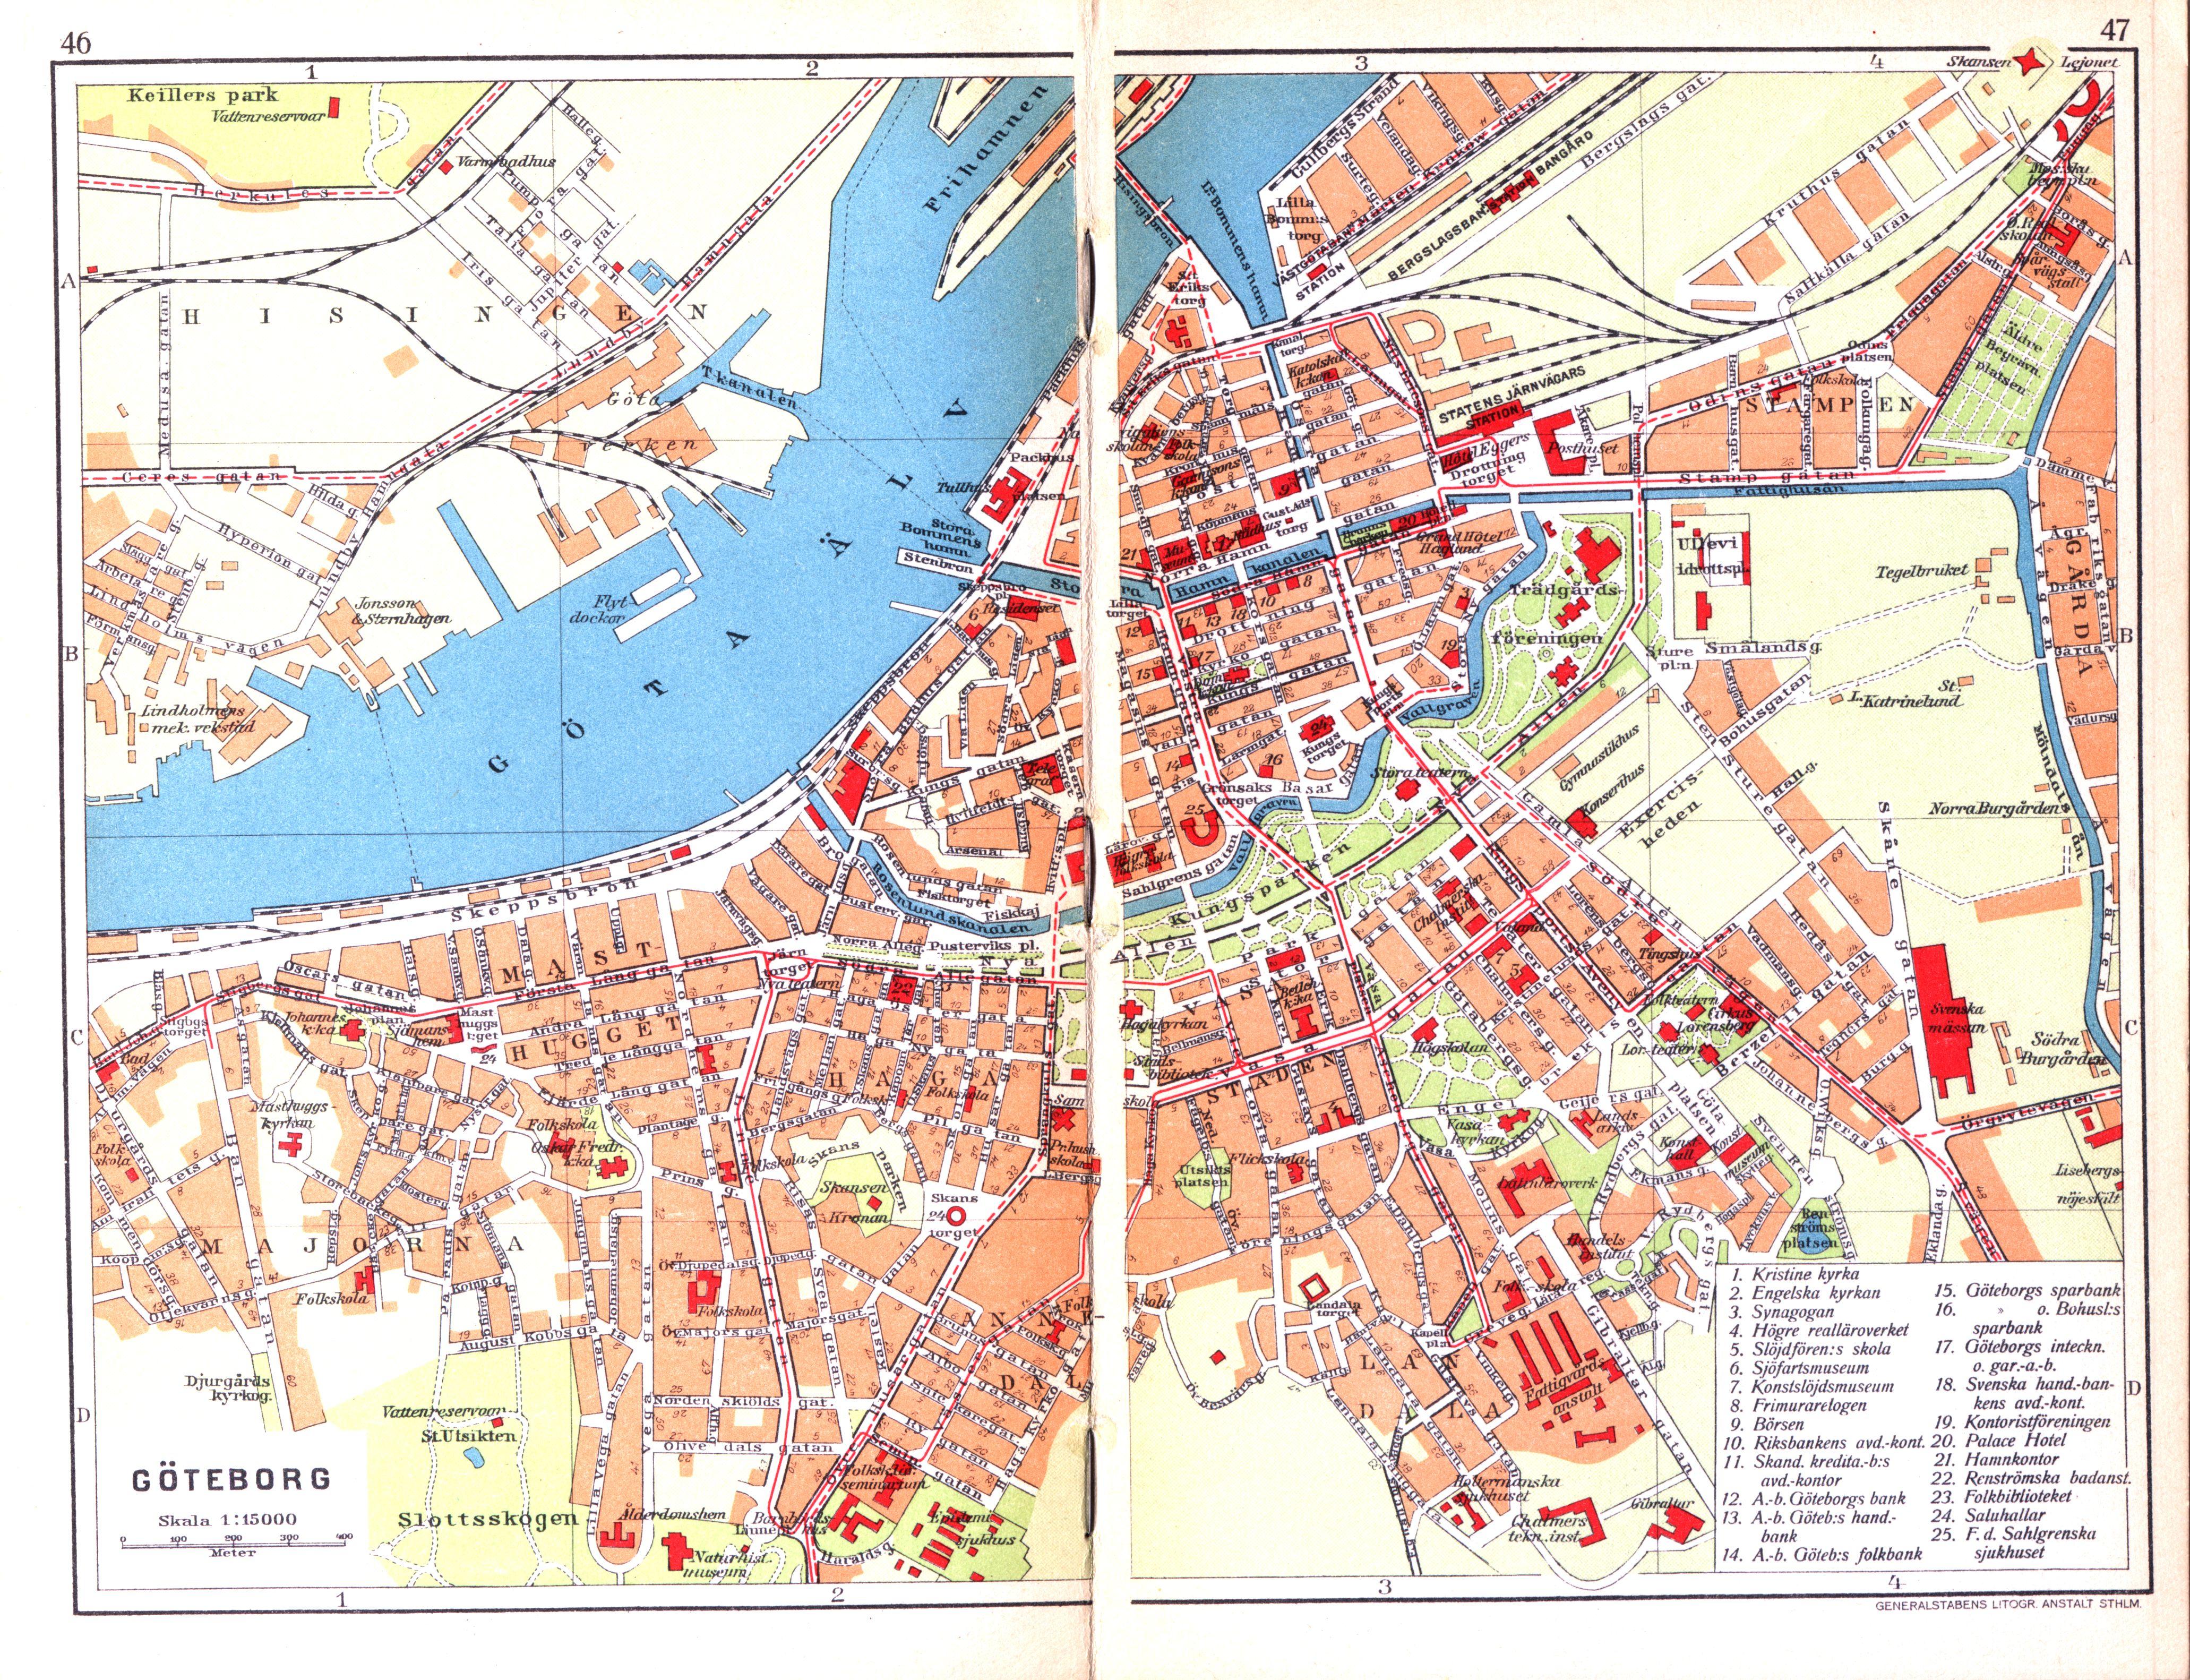 stockholm city karta eskorttjänst göteborg